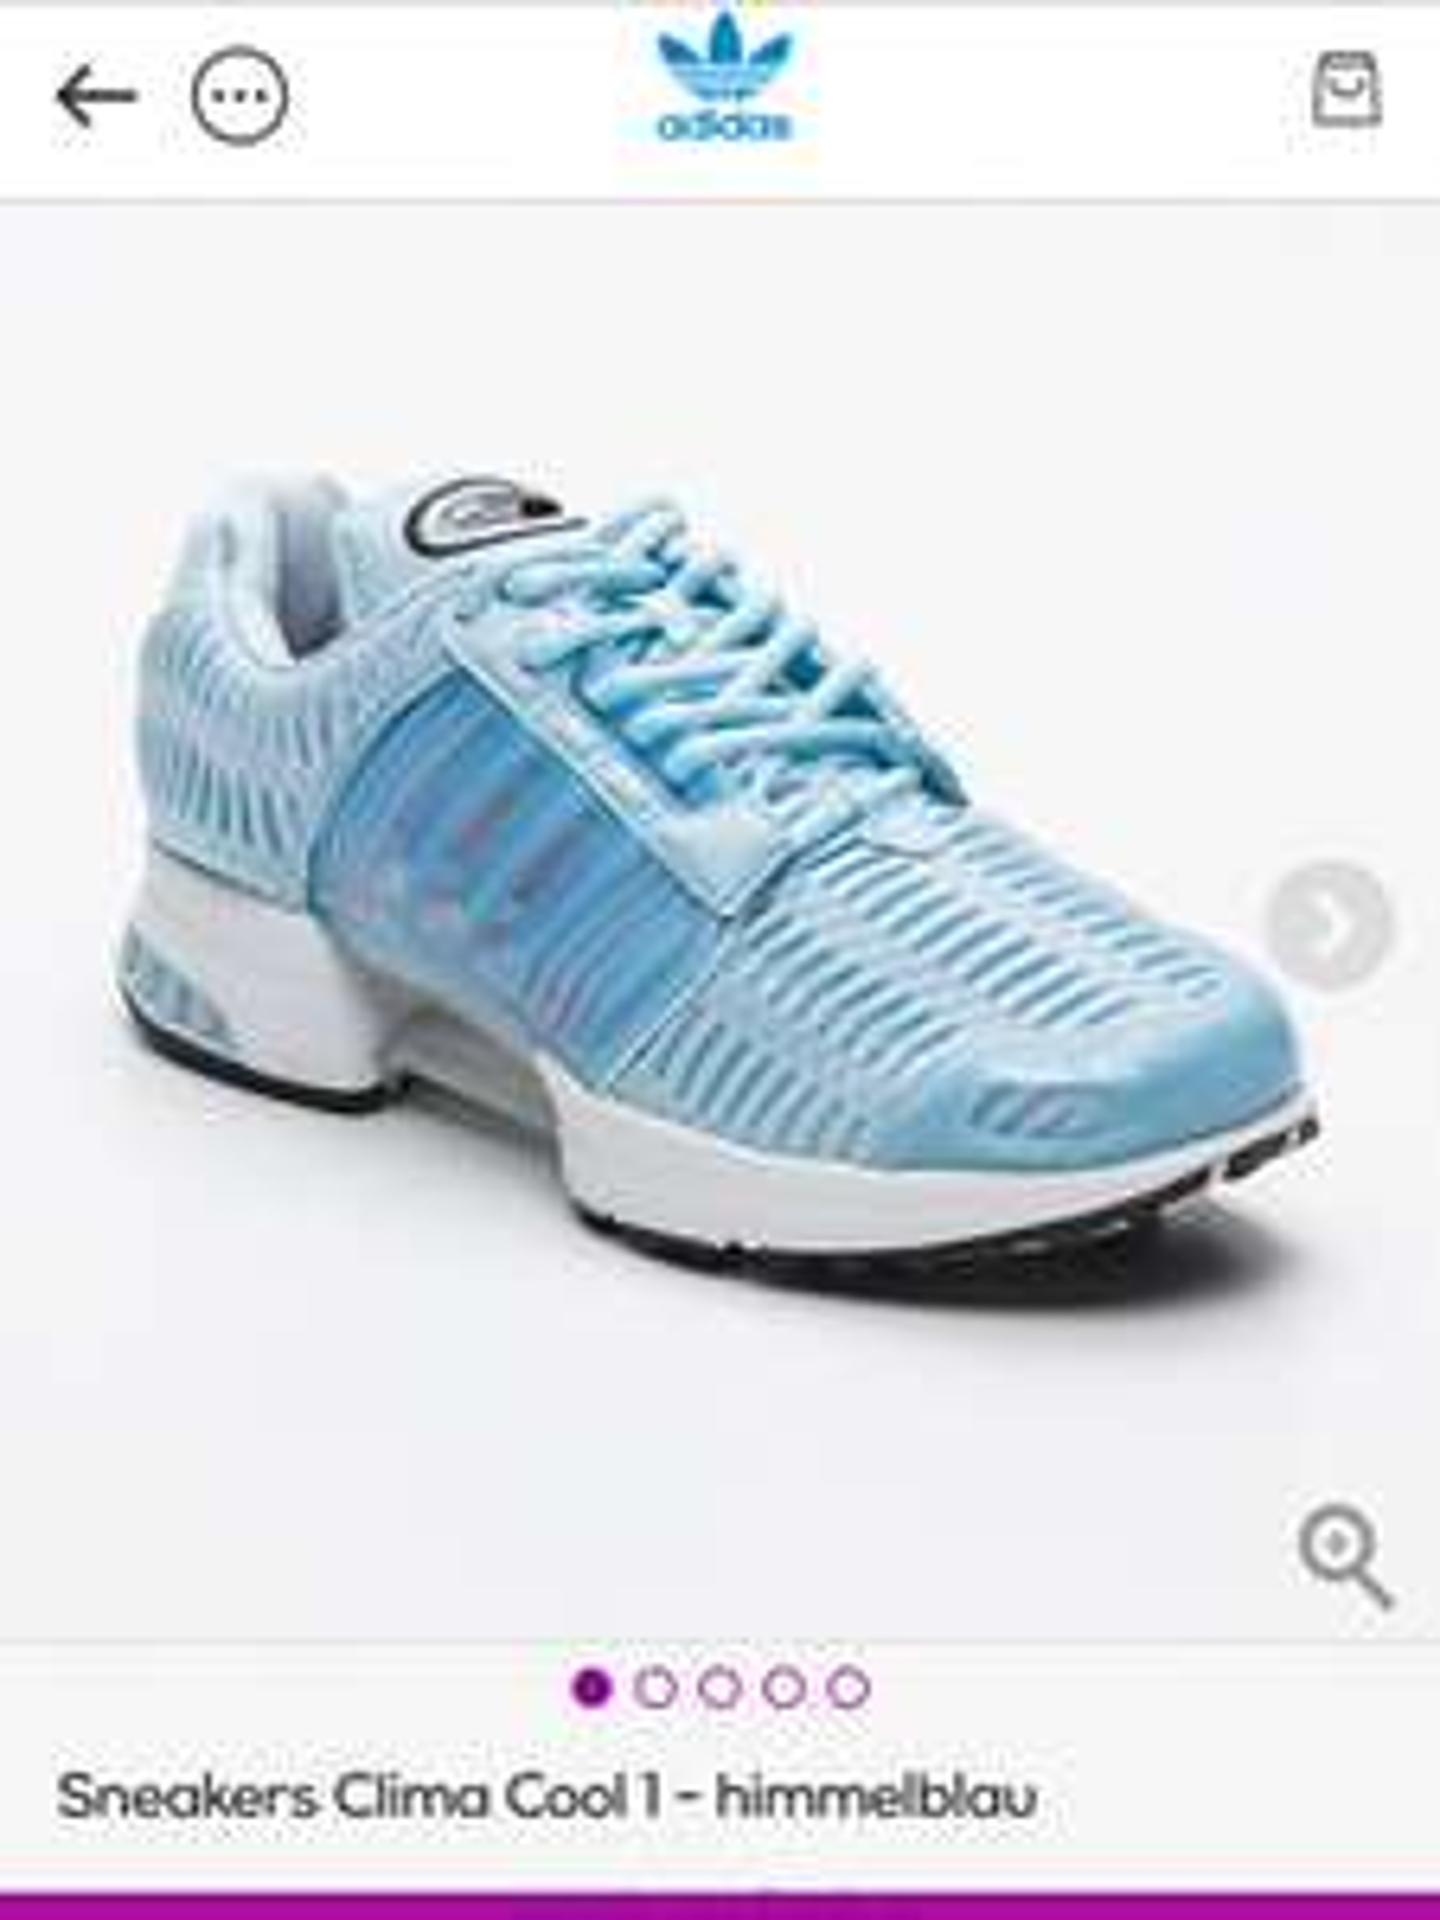 Adidas climacool 1 für 45,50€ bei Vente-Privee